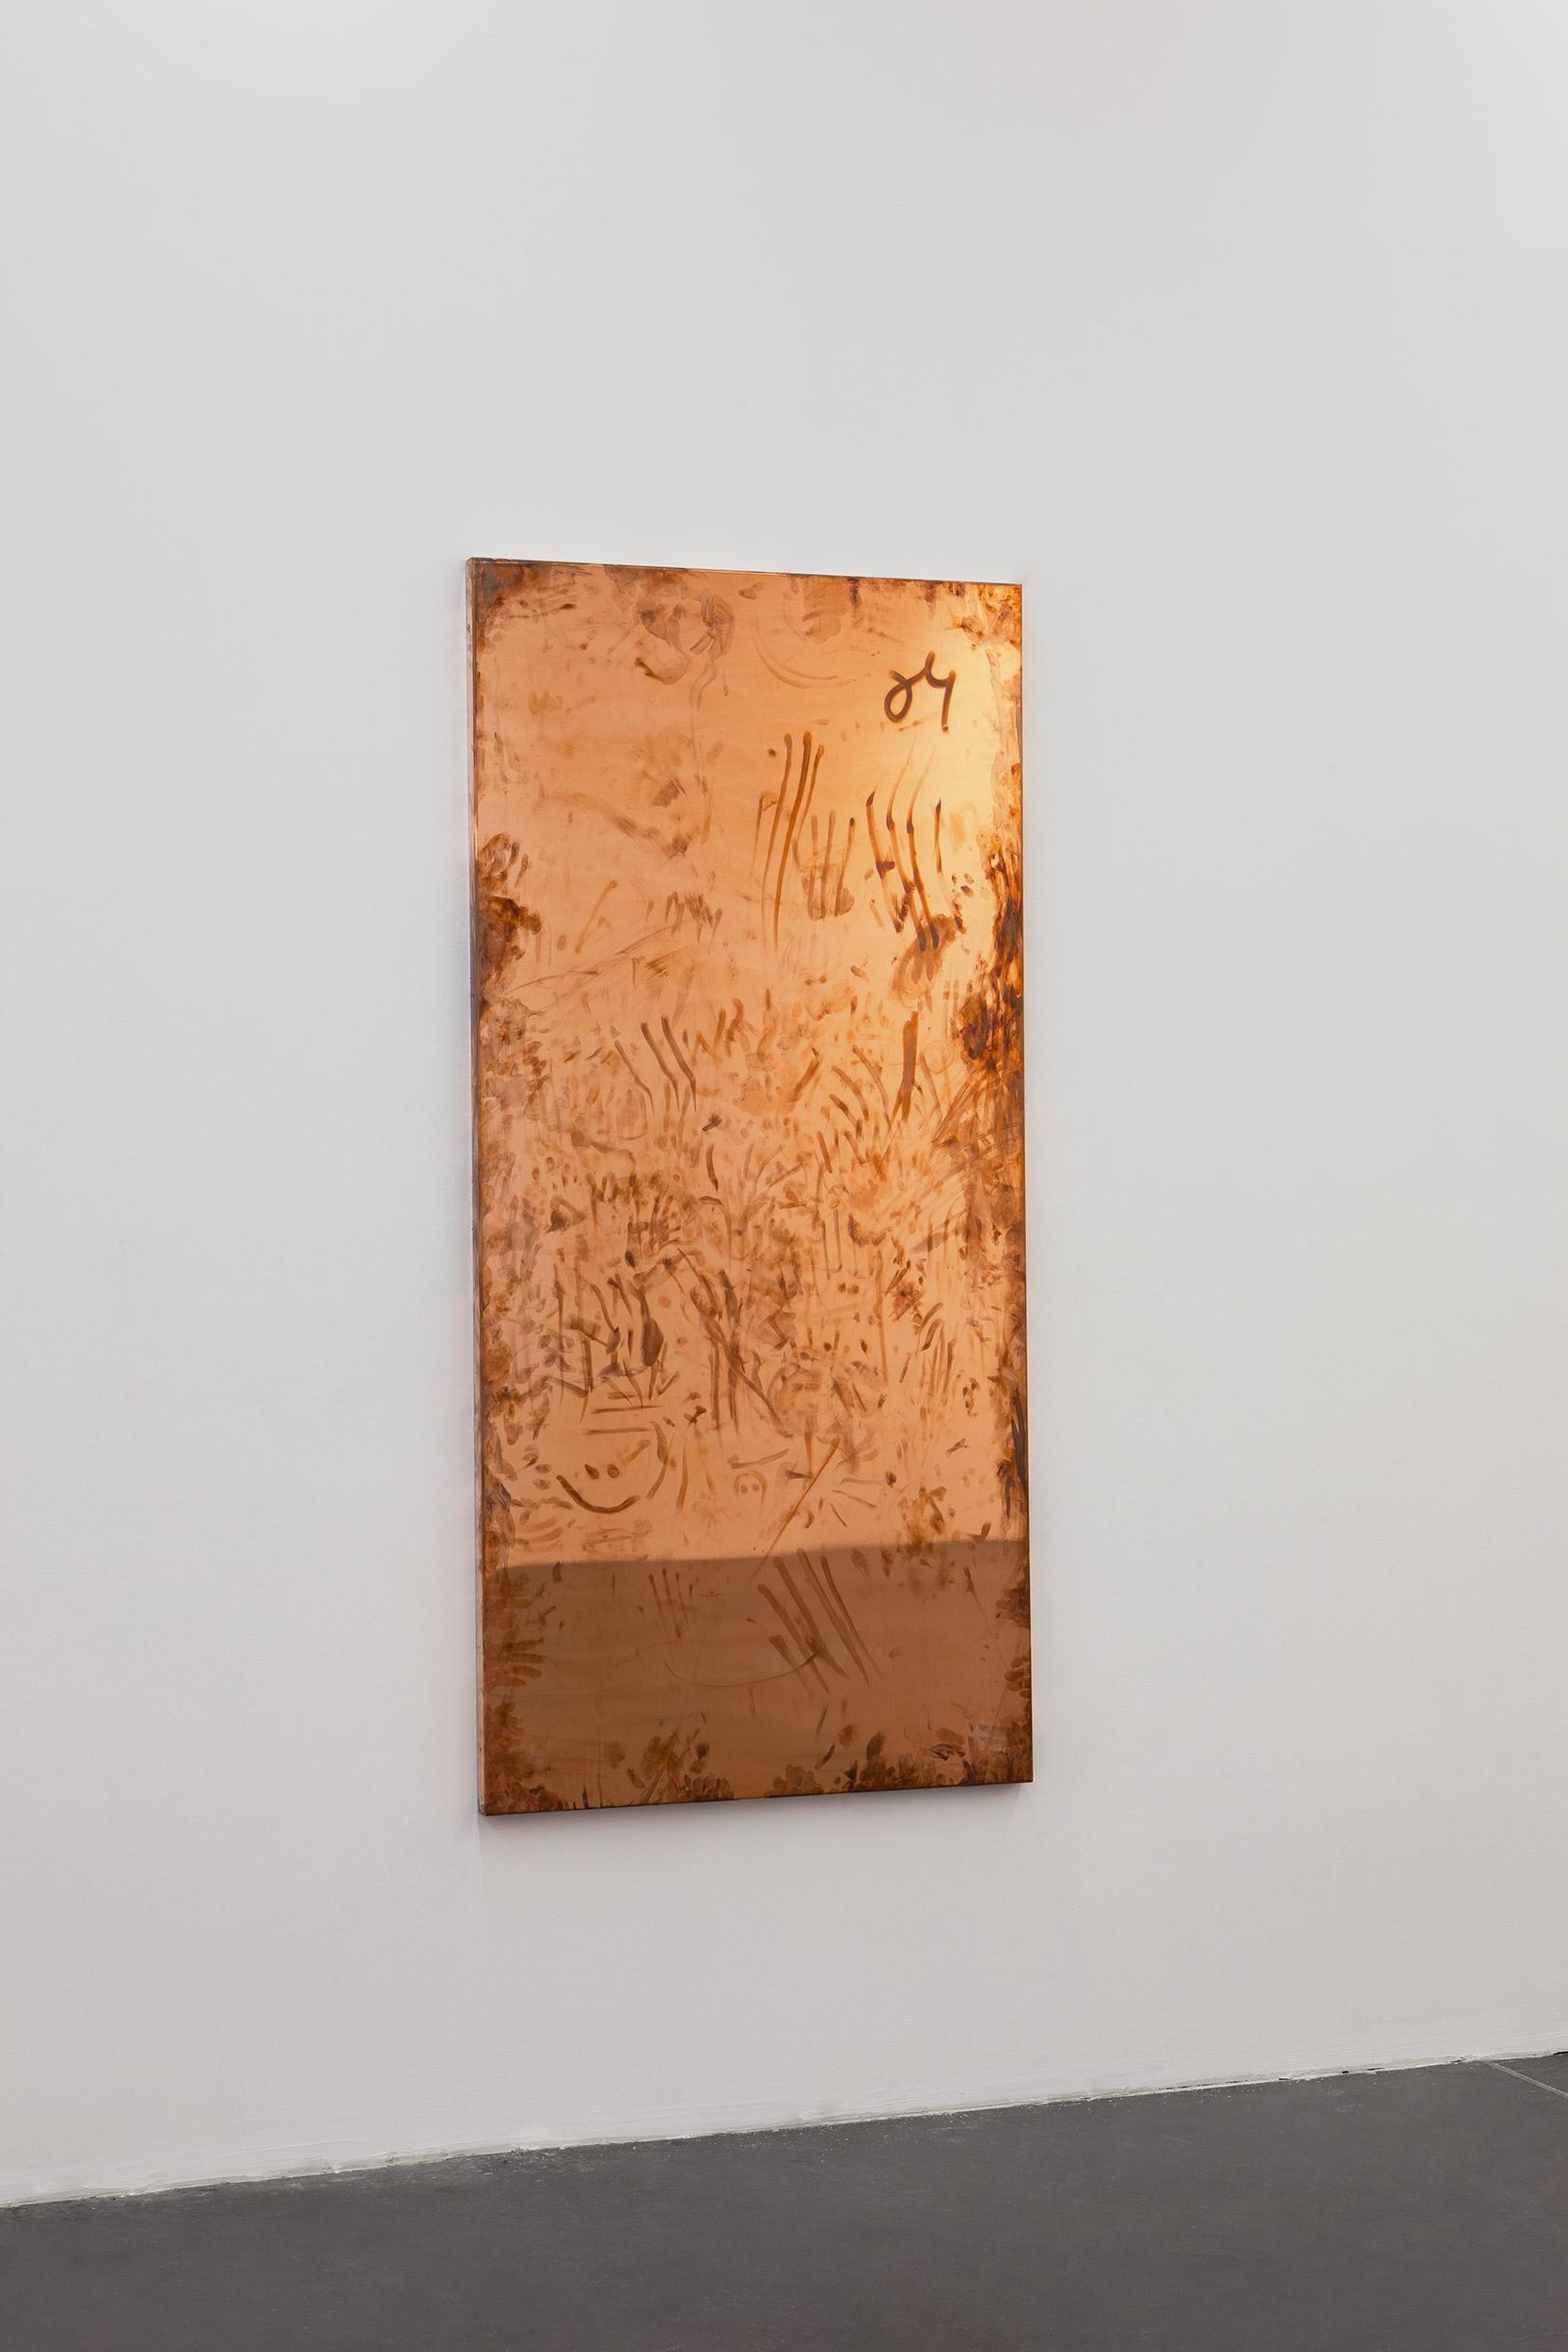 Copper Surrogates (September 20-23/November 21–23, 2011, Beijing, China, June 13–18/November 21, 2012Los Angeles, California, November 29–December 3, 2012, Miami Beach, Florida)    2011   Polished copper  74 3/4 x 35 1/2 x 1 1/2 inches   Surrogates (Full Sheet, Art Handling), 2011–